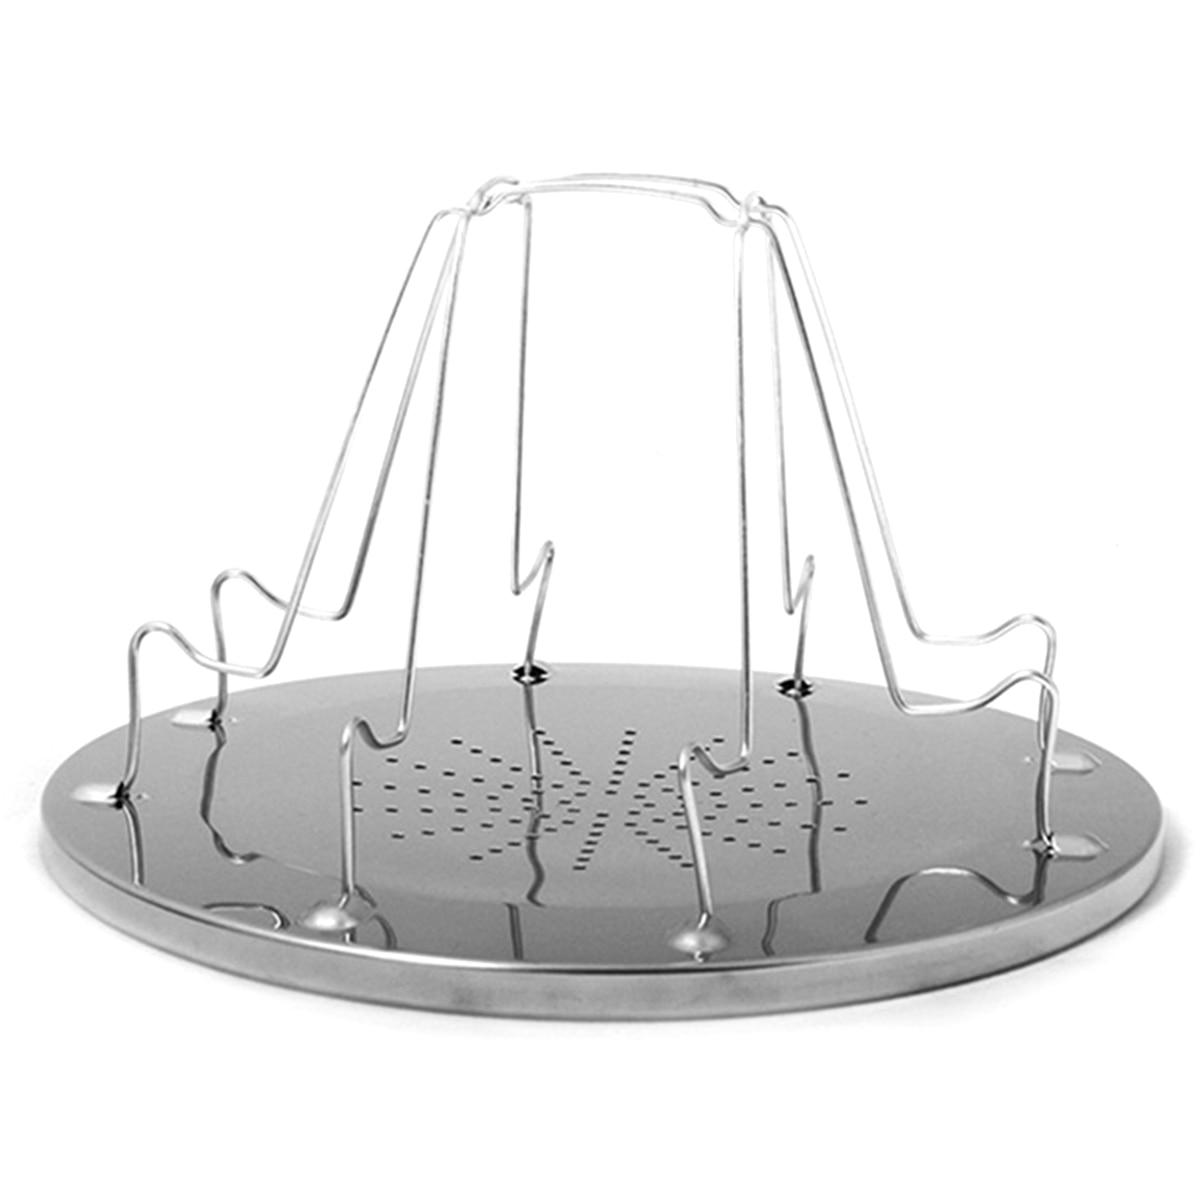 Tostadora portátil Simple de acero inoxidable, Parrilla portátil plegable para acampar al aire libre, parrilla multiusos